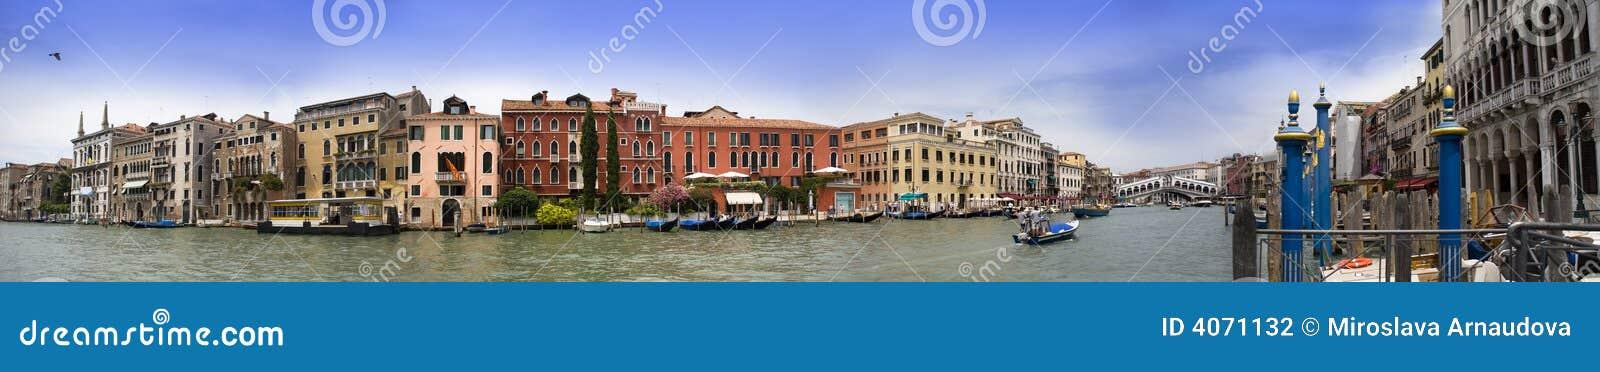 Panorama frrom Venice